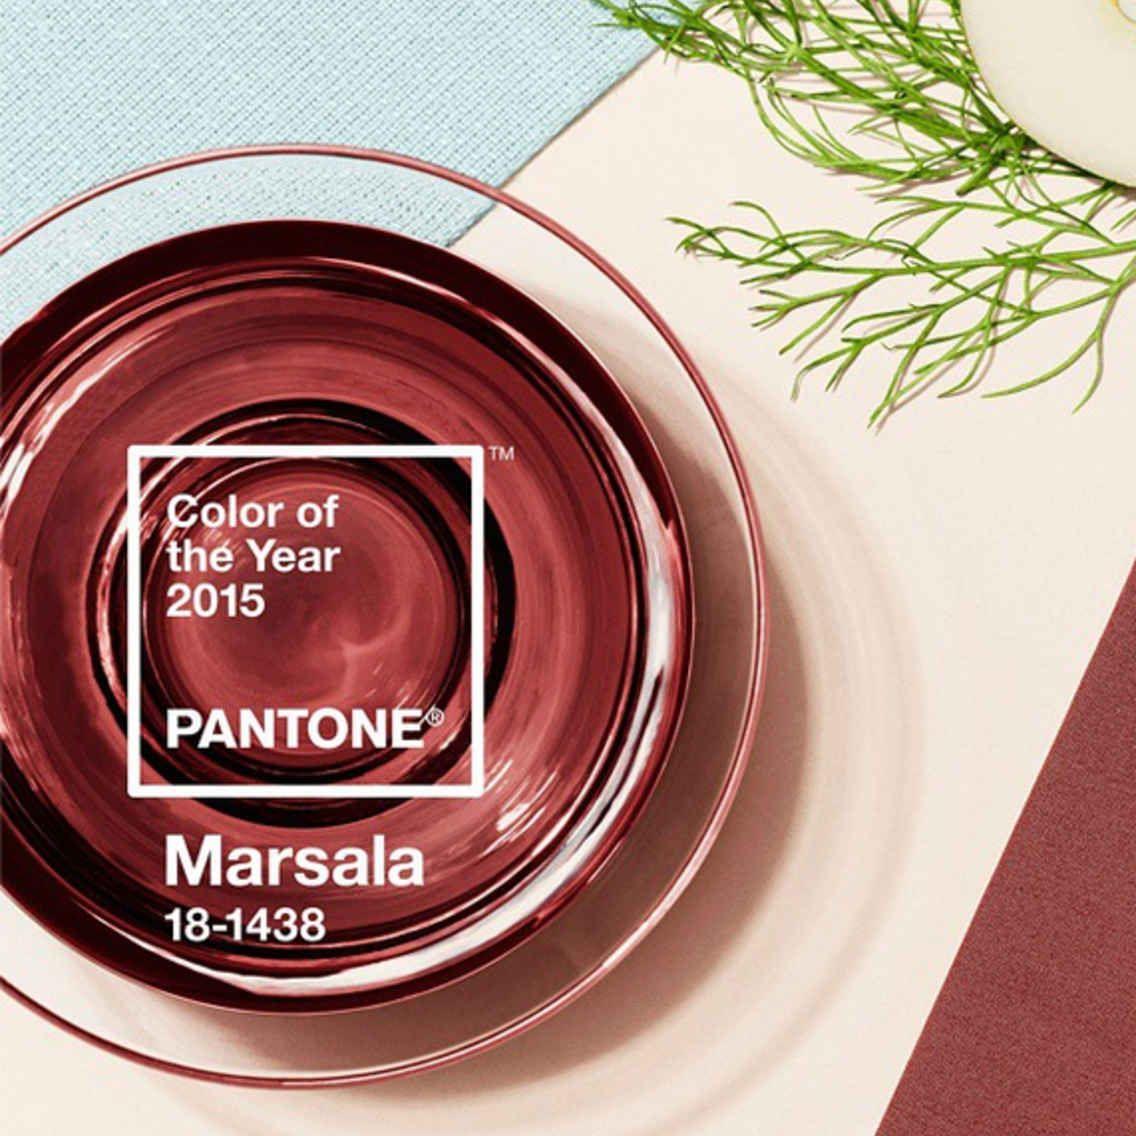 Pantone S 2015 Color Of The Year Is Marsala Marsala Color Pantone Pantone Marsala